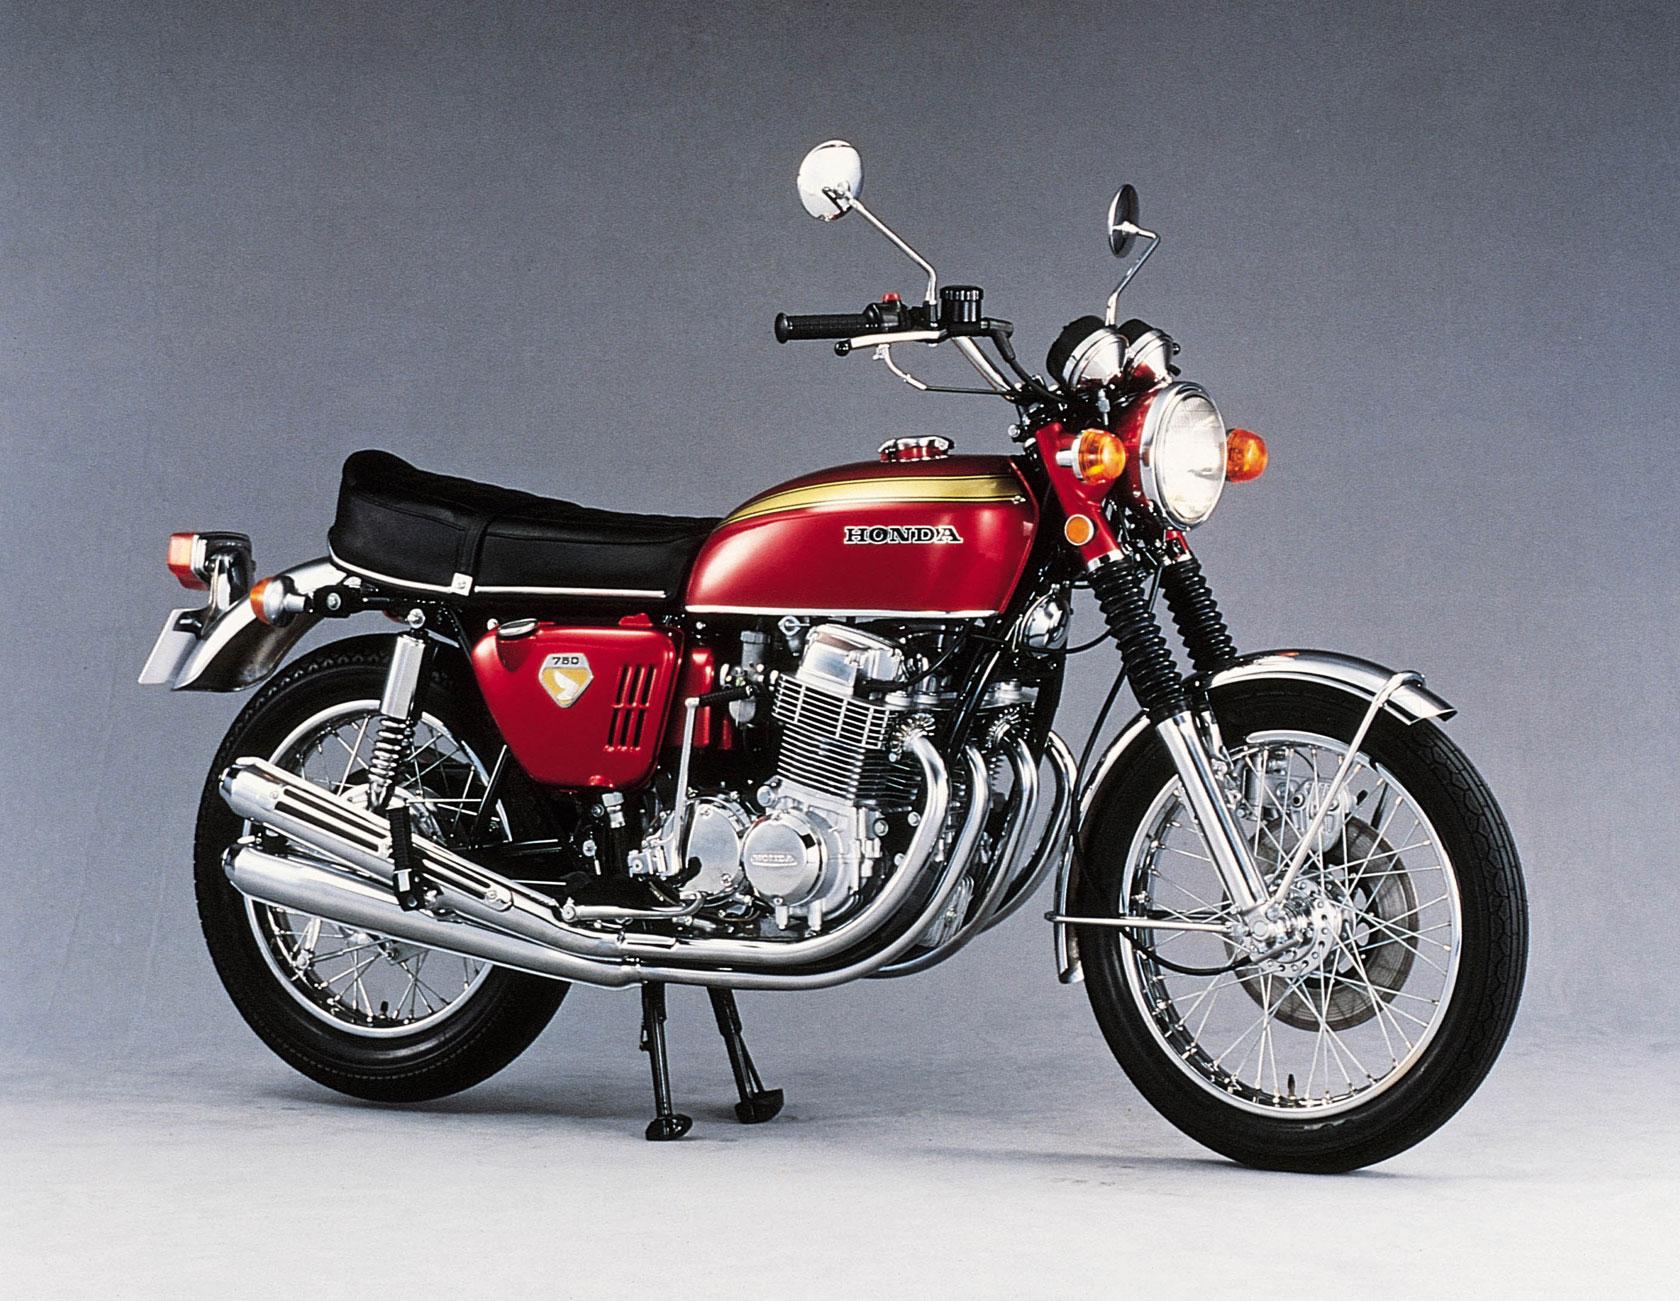 1969 Honda 750 K 1 Wiring Trusted Schematics Diagram 1971 Four Cb K1 Specs 1970 Autoevolution Fuel Tank